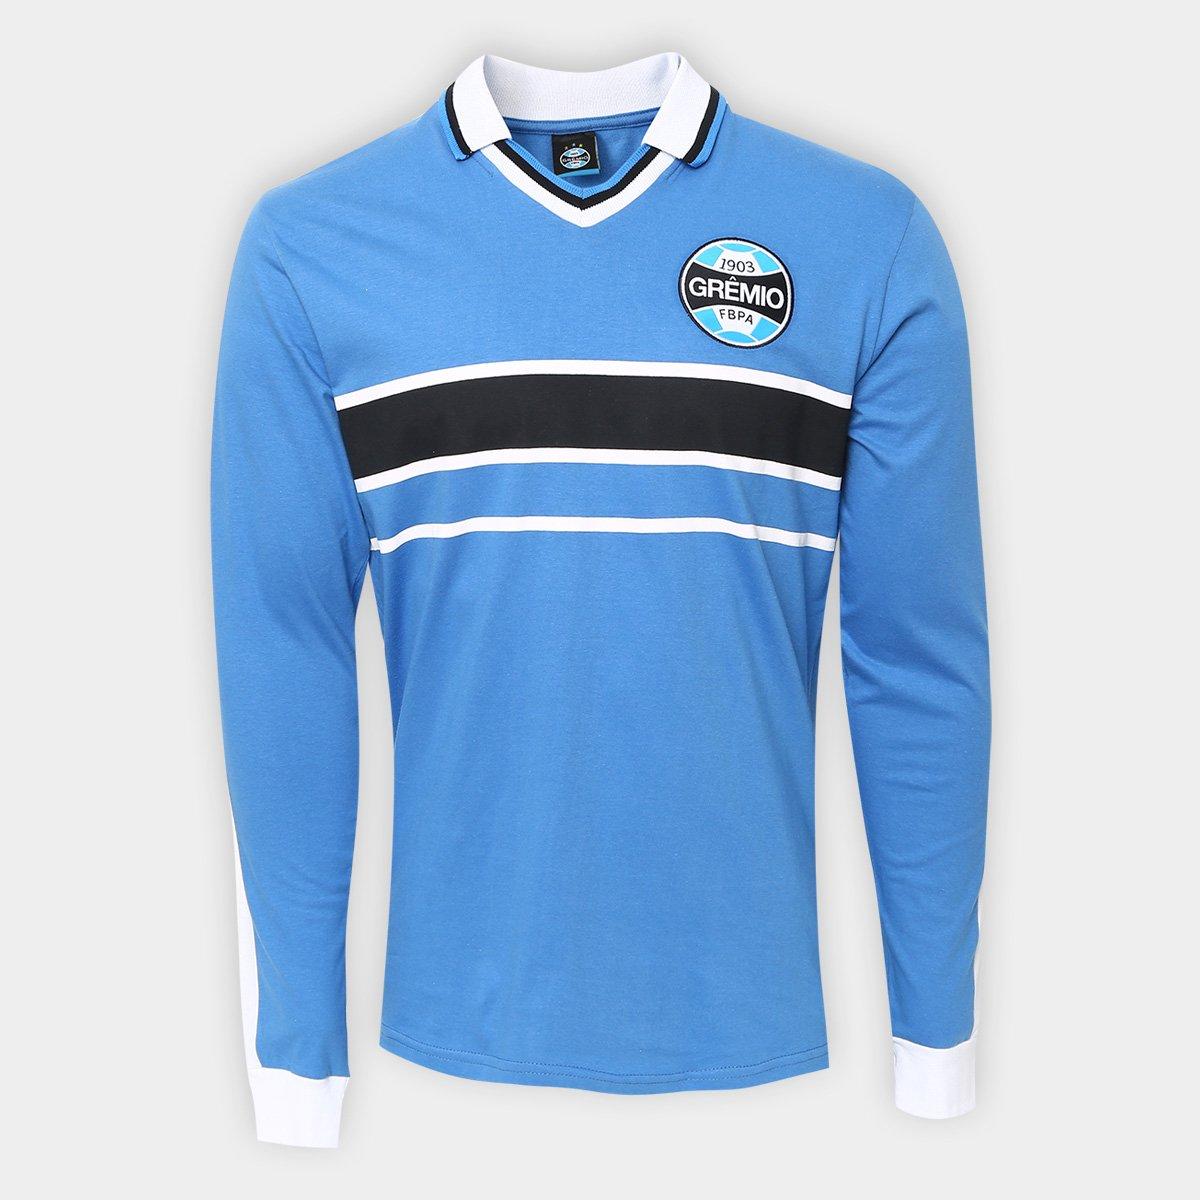 3fd5ed3ace Camisa Manga Longa Grêmio Réplica 2001 Masculina - Azul - Compre ...